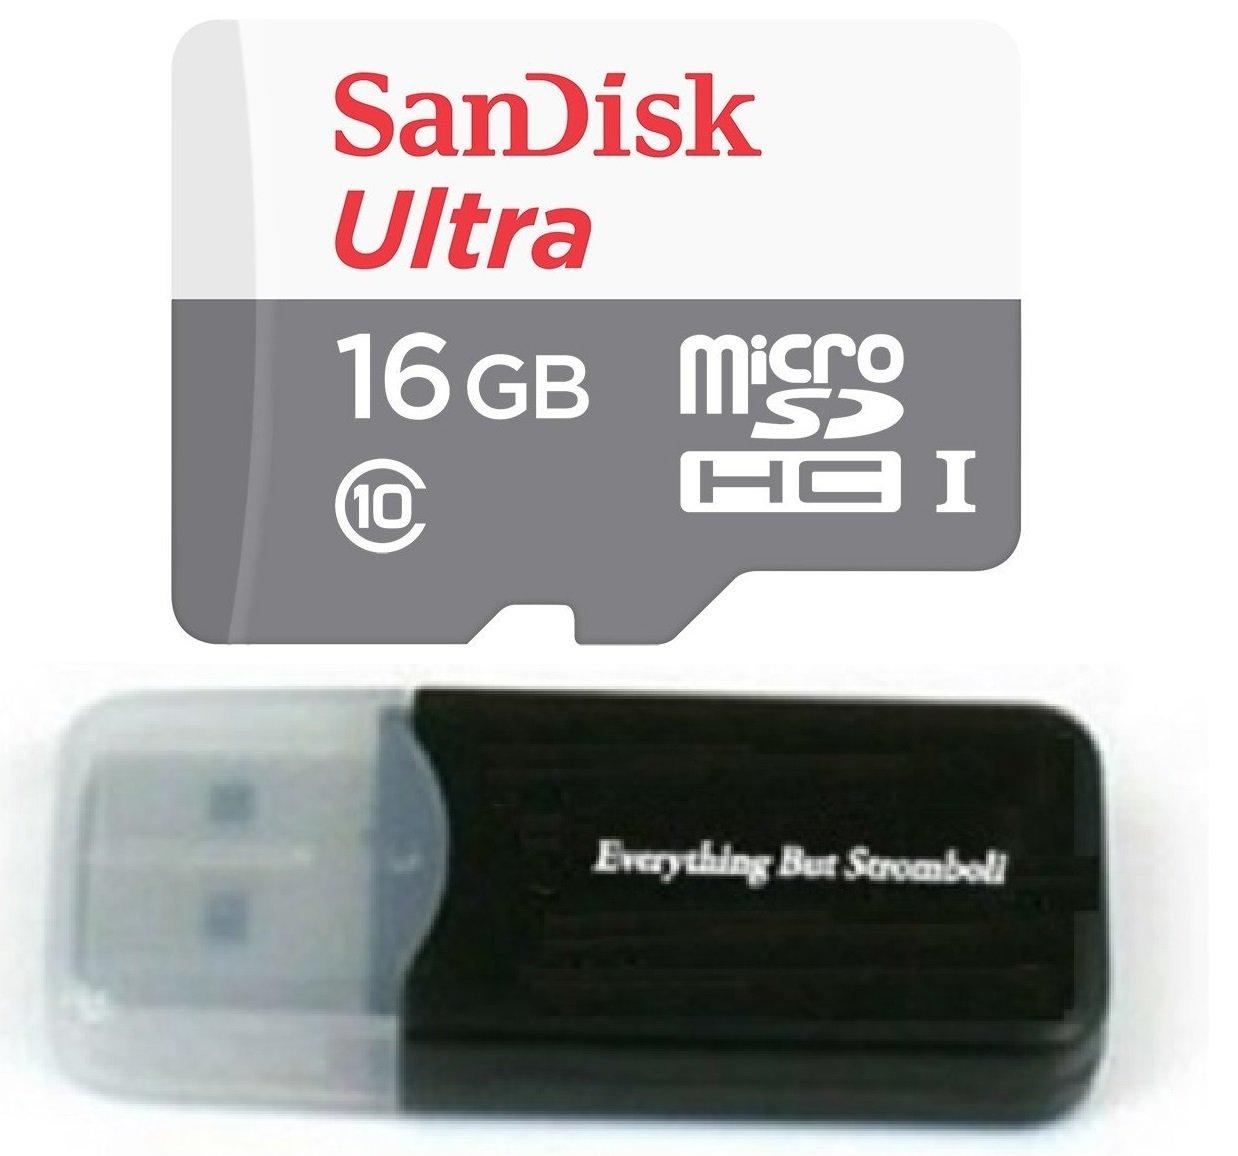 Sandisk Micro SDXC Ultra MicroSD TF Flash Memory